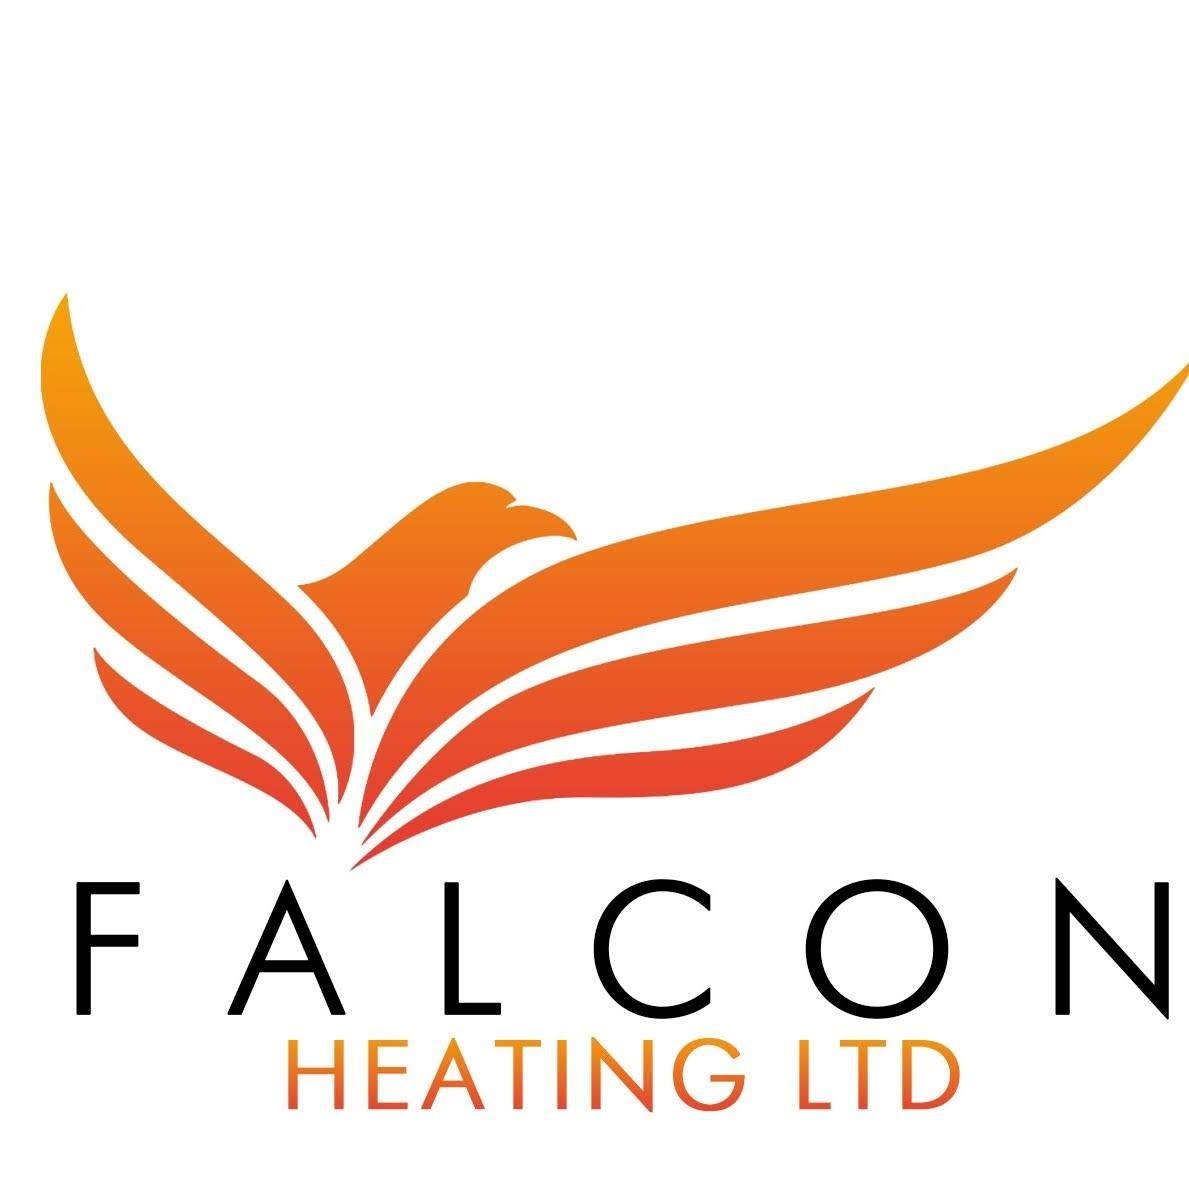 Falcon Heating Ltd Verified Logo